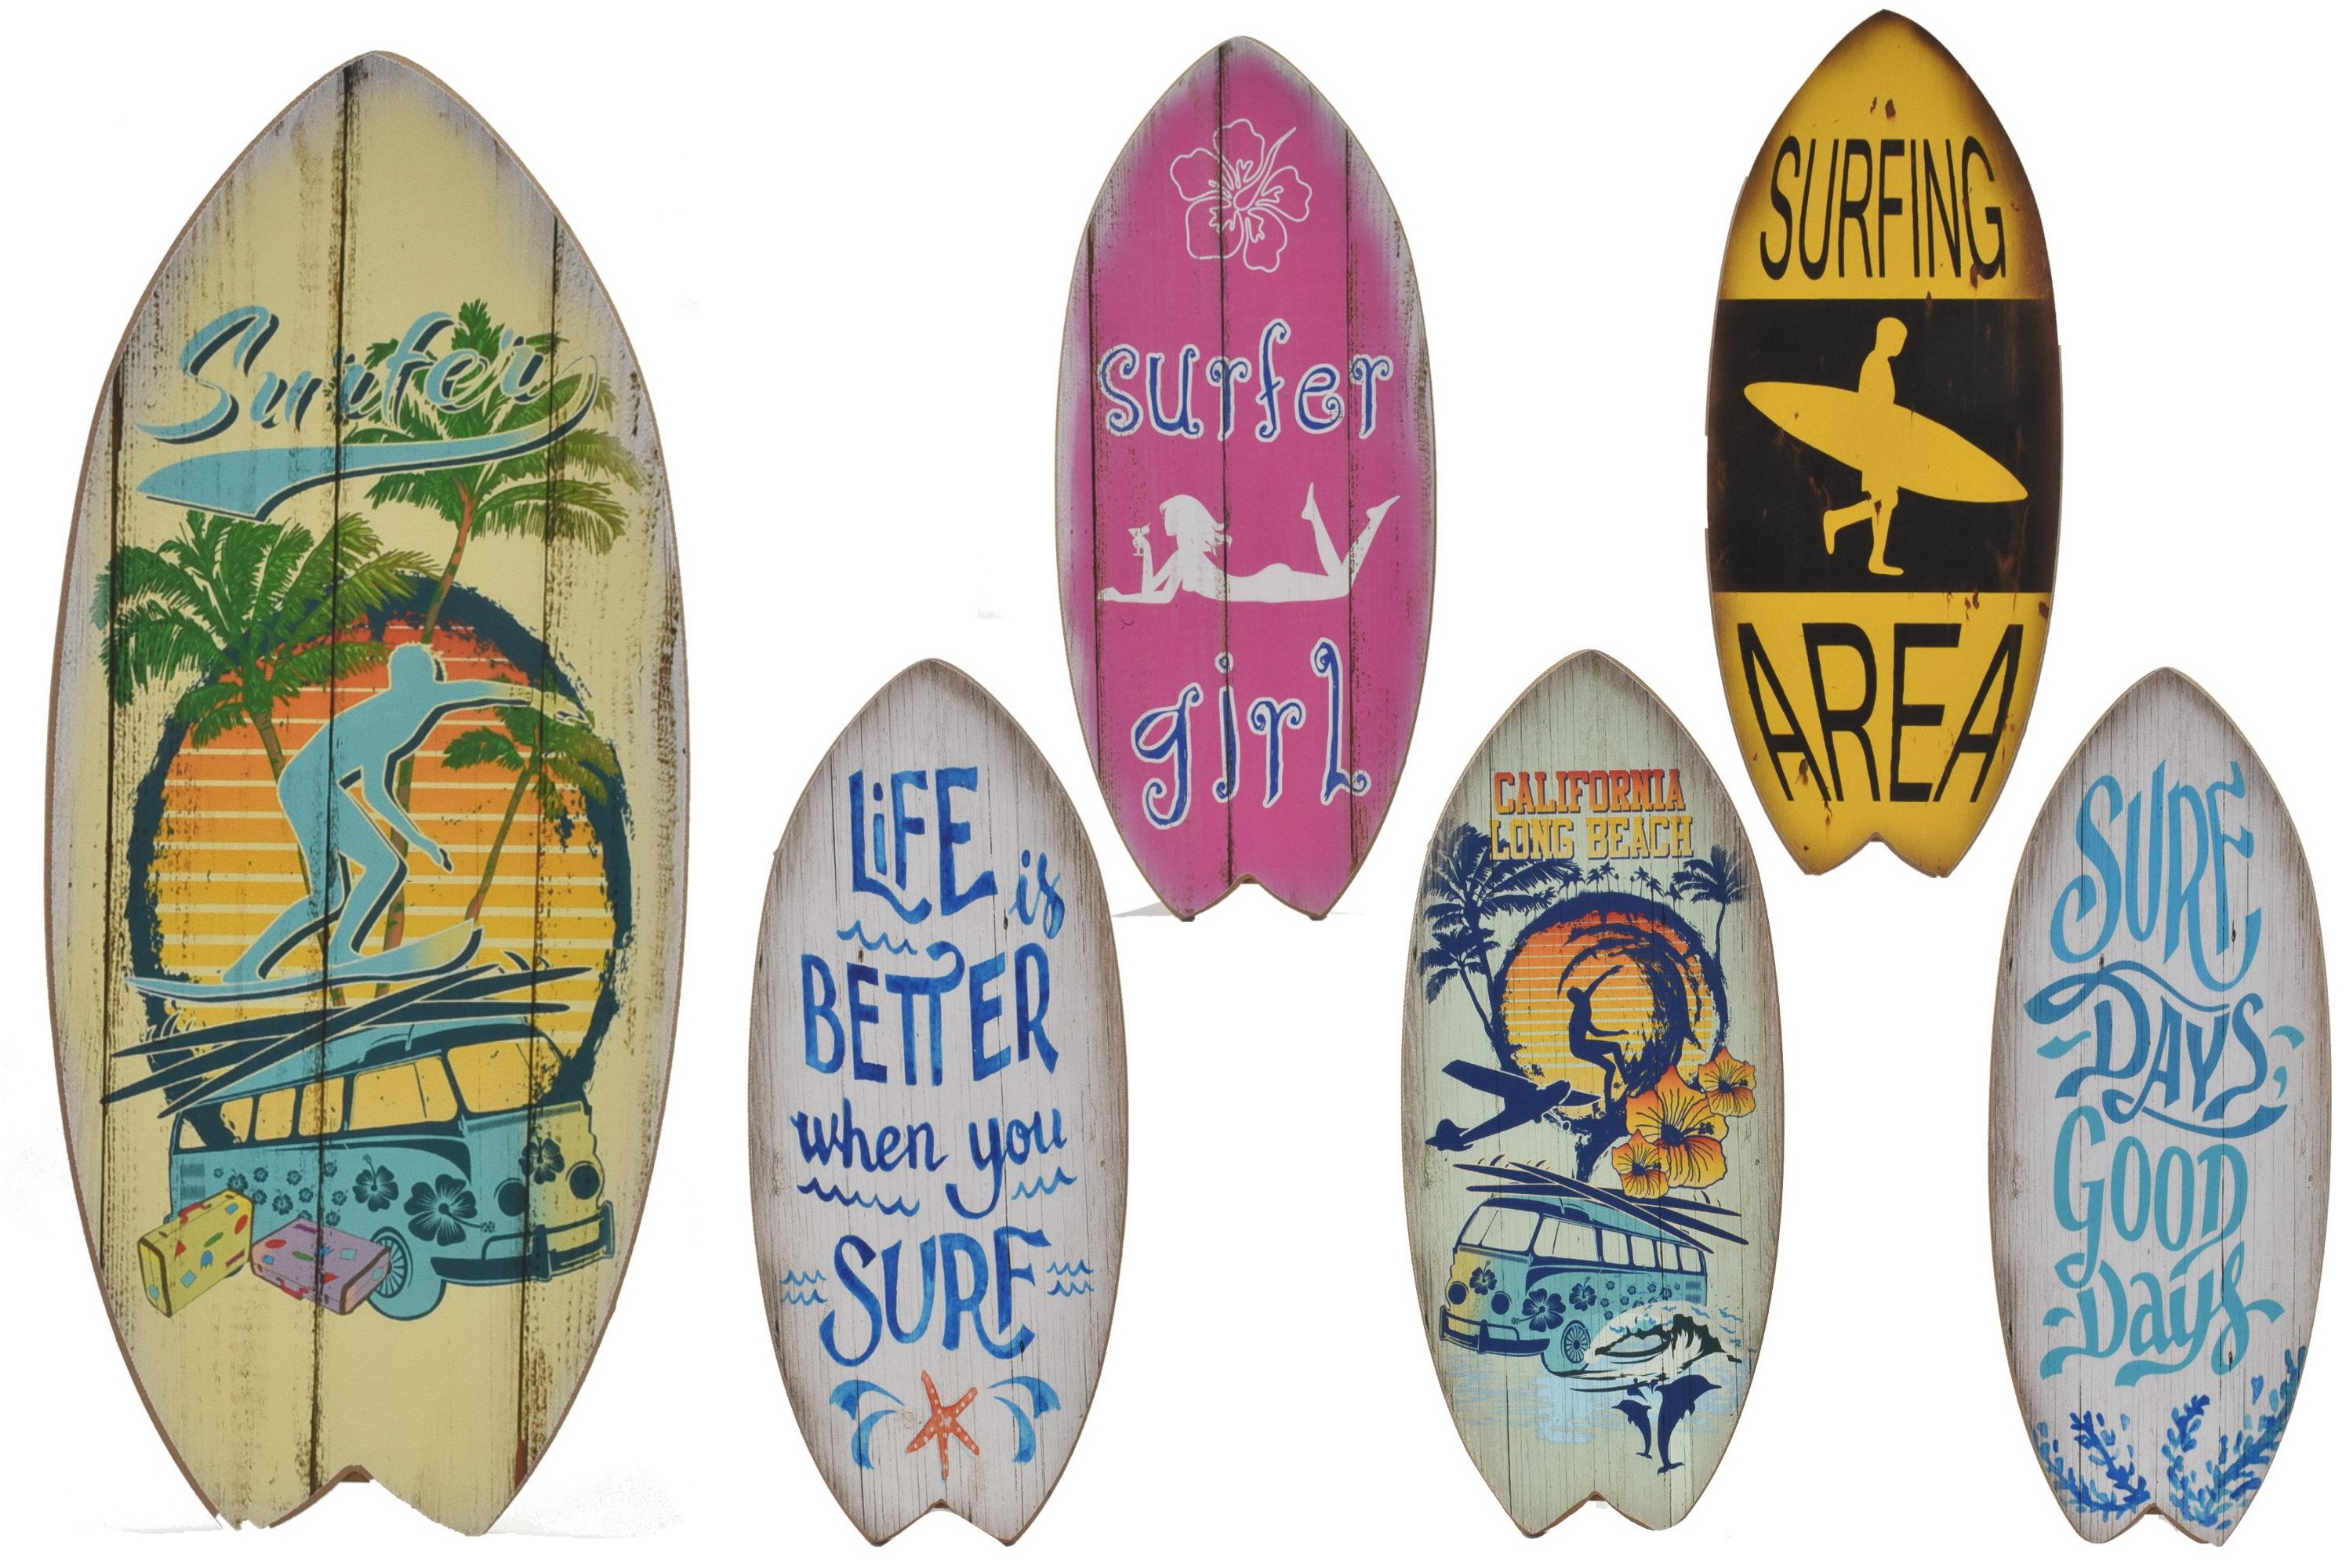 30 x 13cm Wooden Surfboard 6 Assorted Designs